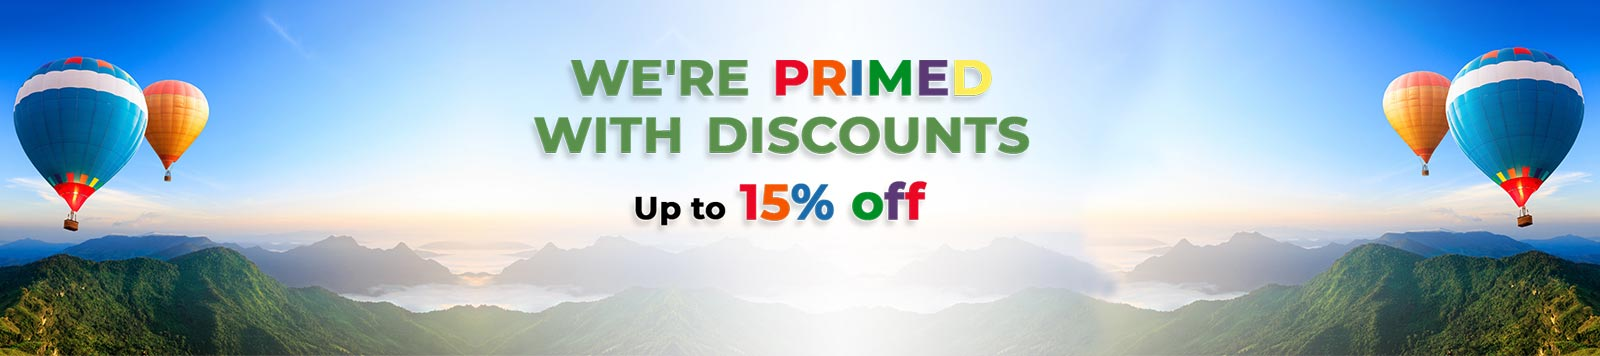 HPFY 2-Day Biggest Sale